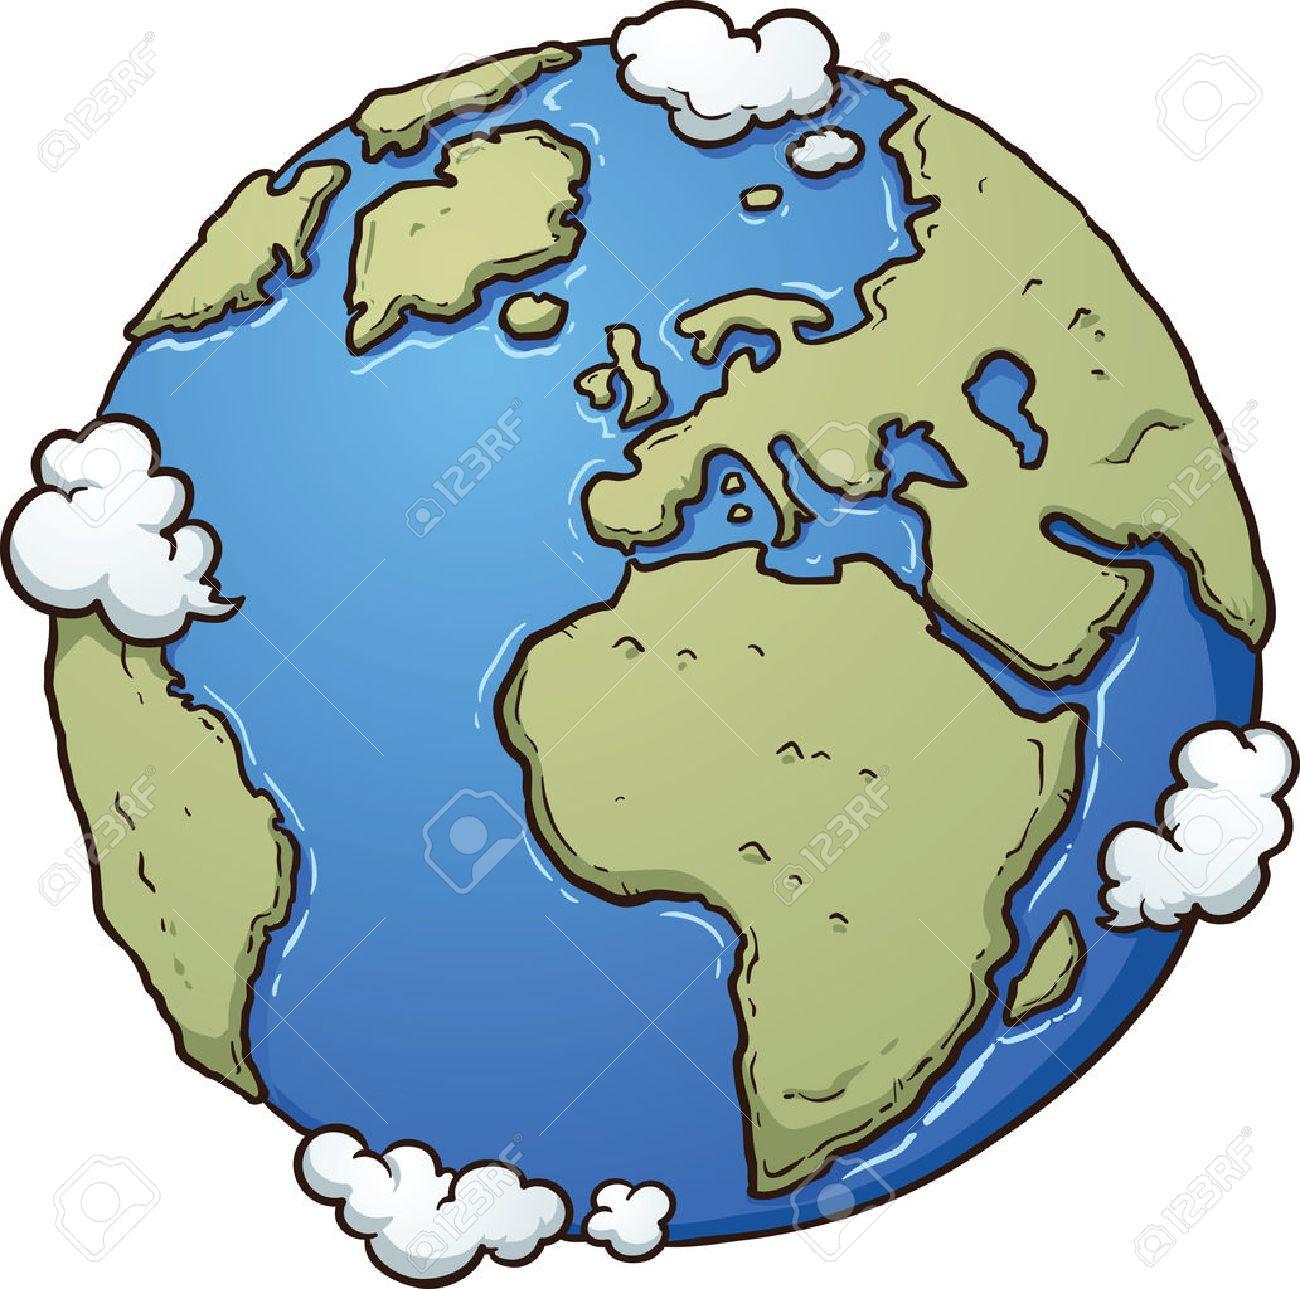 Cartoon earth vector clip art illustration with simple gradients cartoon earth vector clip art illustration with simple gradients all in a single layer publicscrutiny Images